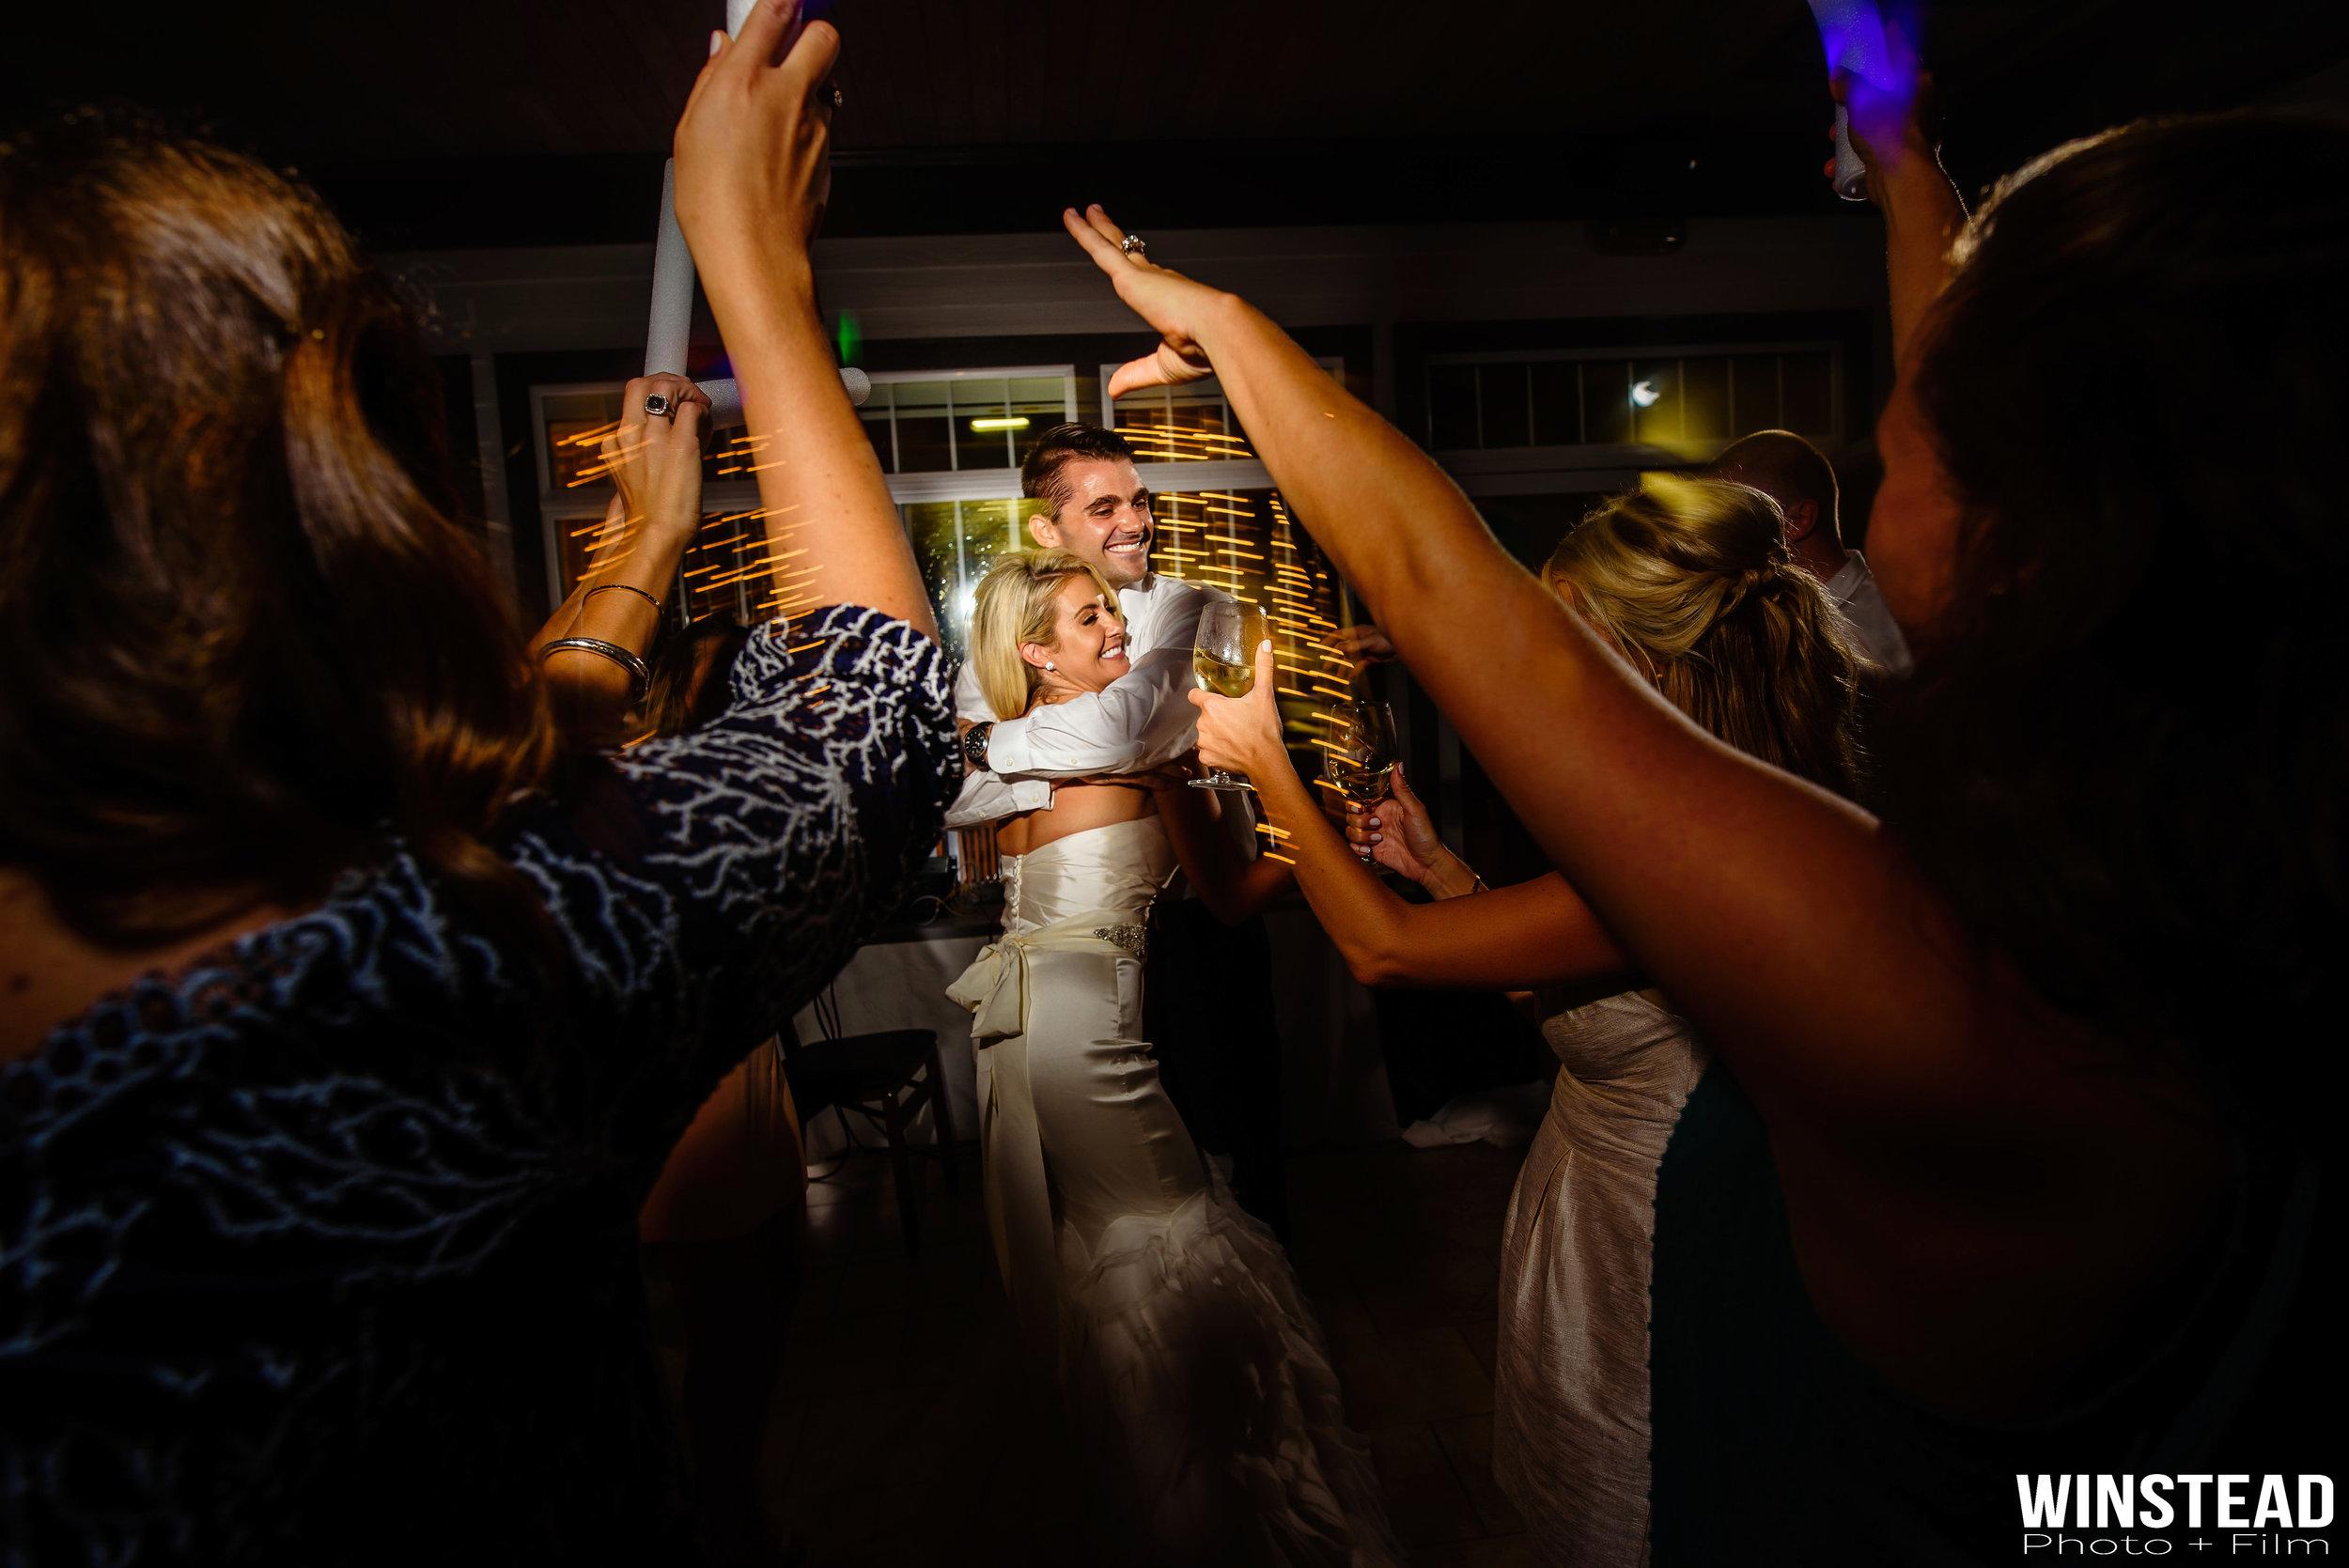 beaufort-nc-boat-house-reception-dancing.jpg